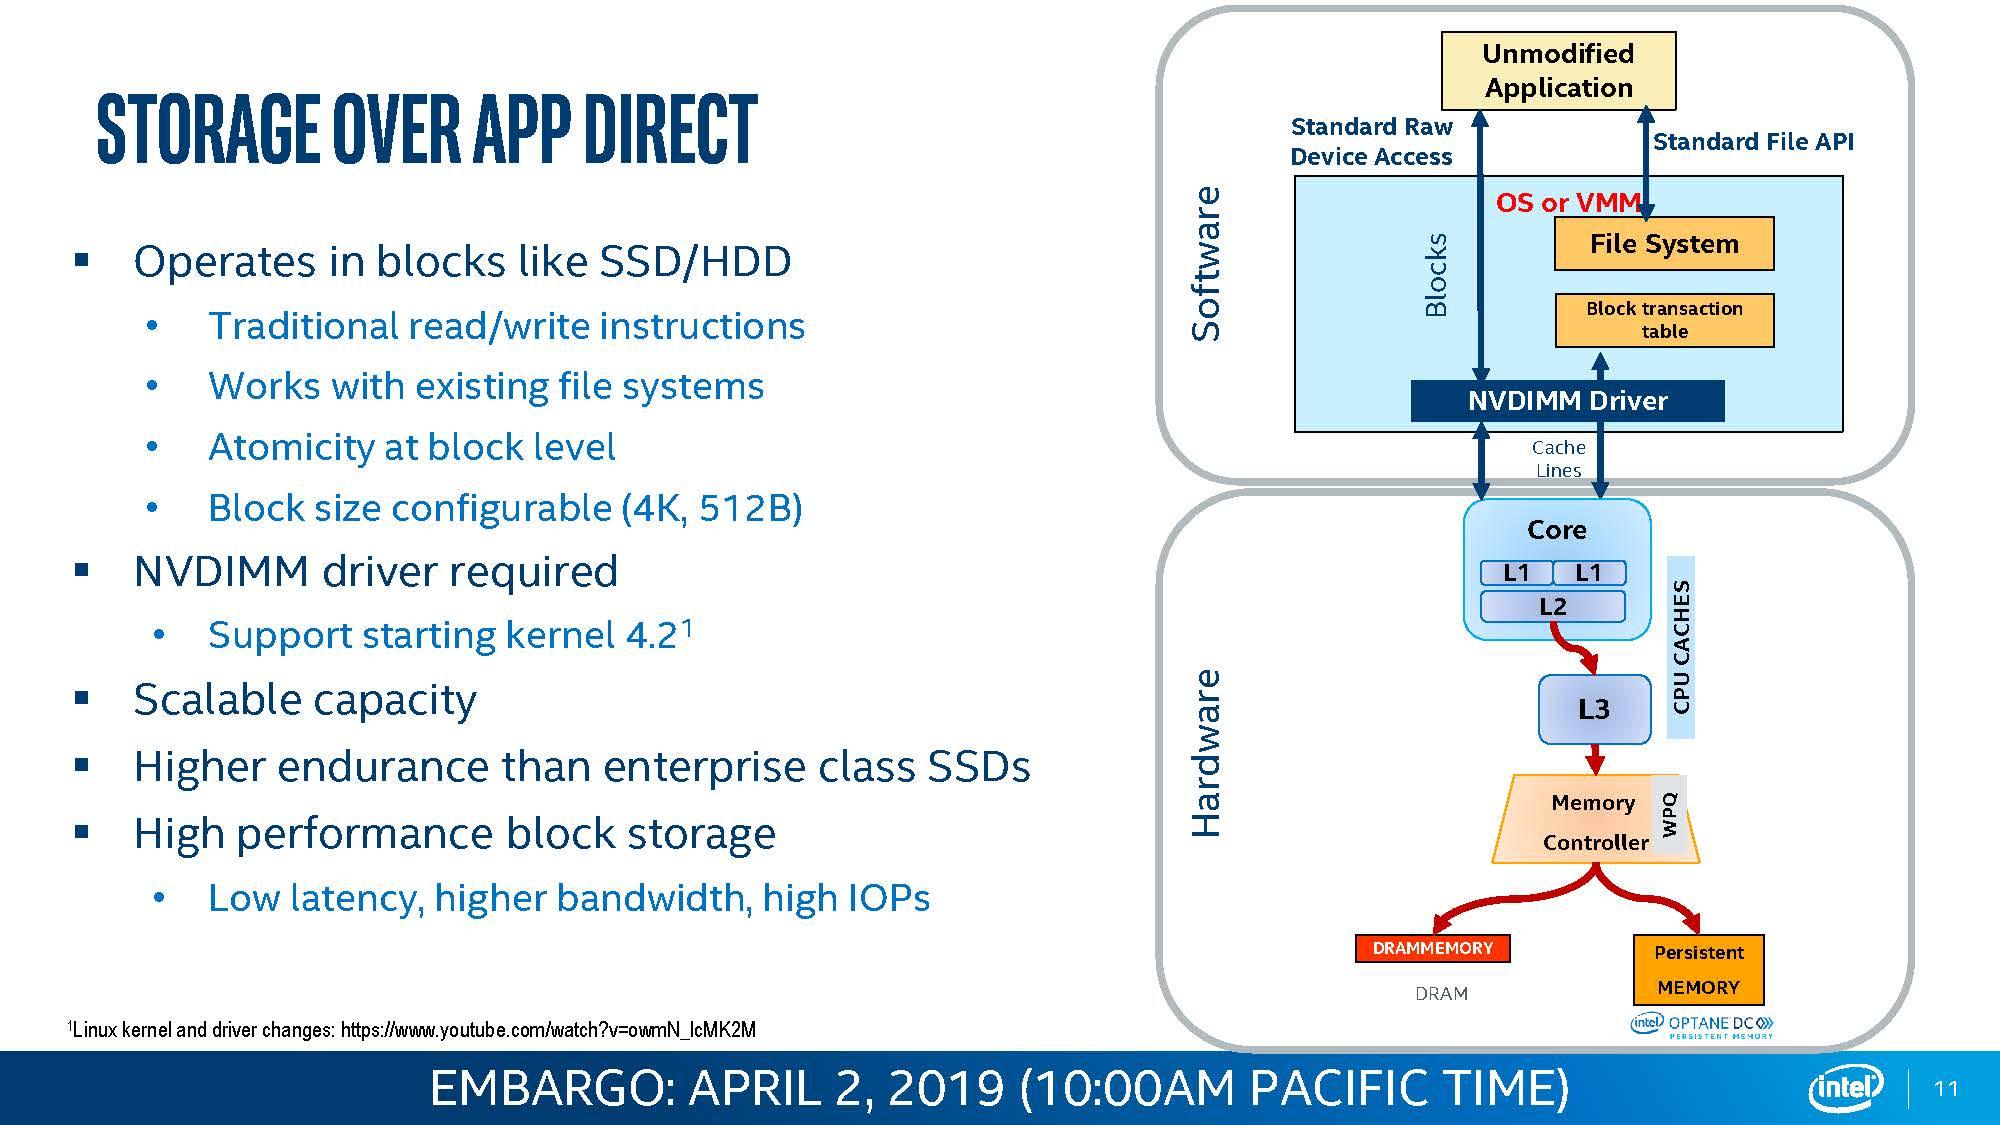 Intel Optane DCPMM Storage Over App Direct